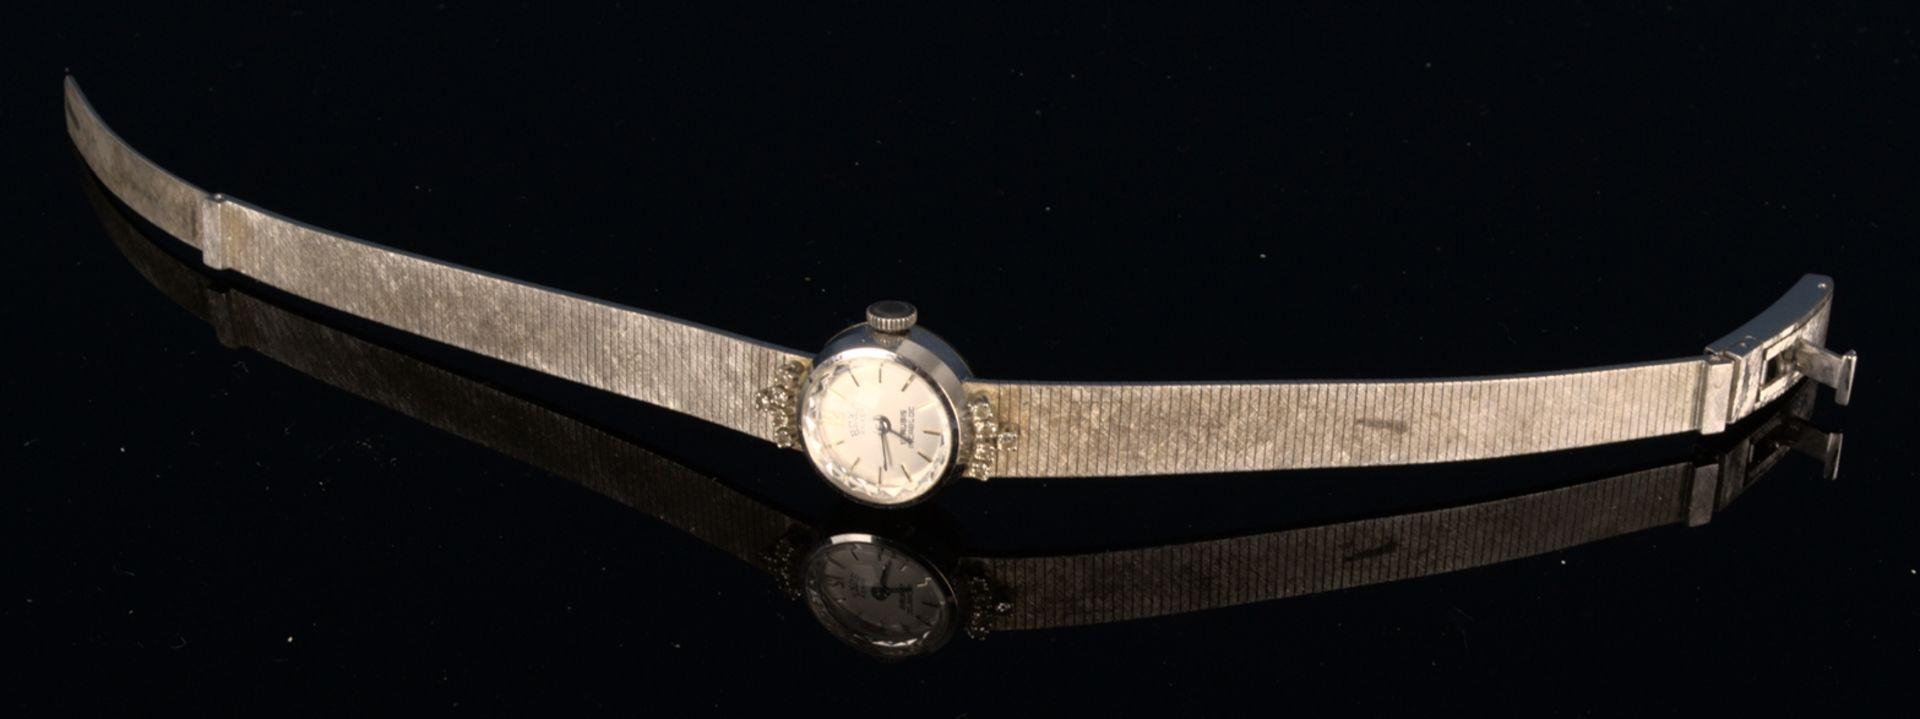 "Elegante COCKTAIL - Damenarmbanduhr der Marke ""ANKER - ROXY"" - 17 Rubis - Incabloc. Handaufzug, - Bild 2 aus 11"